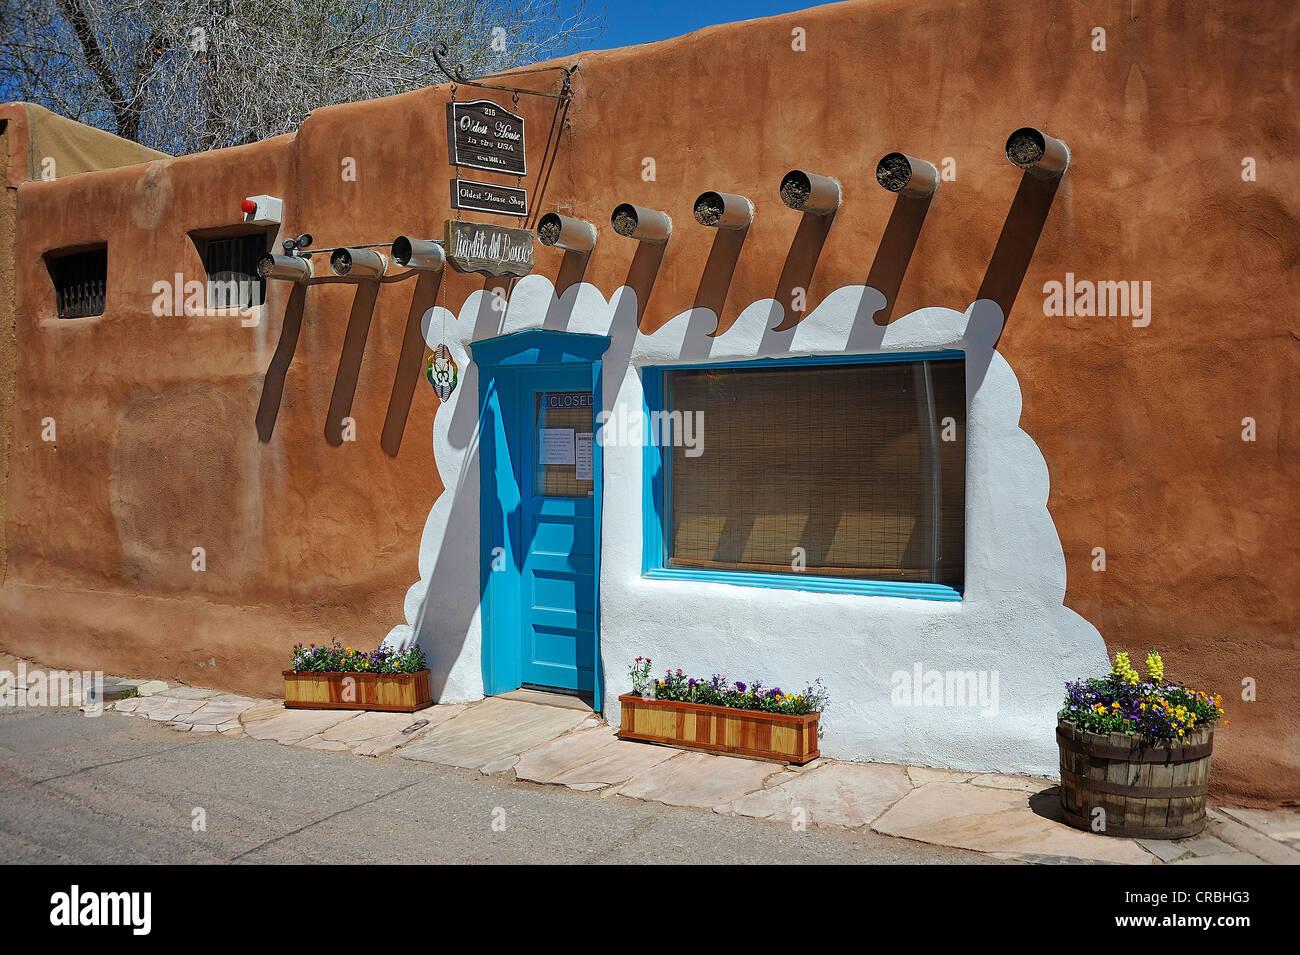 Adobe architecture, Santa Fe, New Mexico, USA - Stock Image